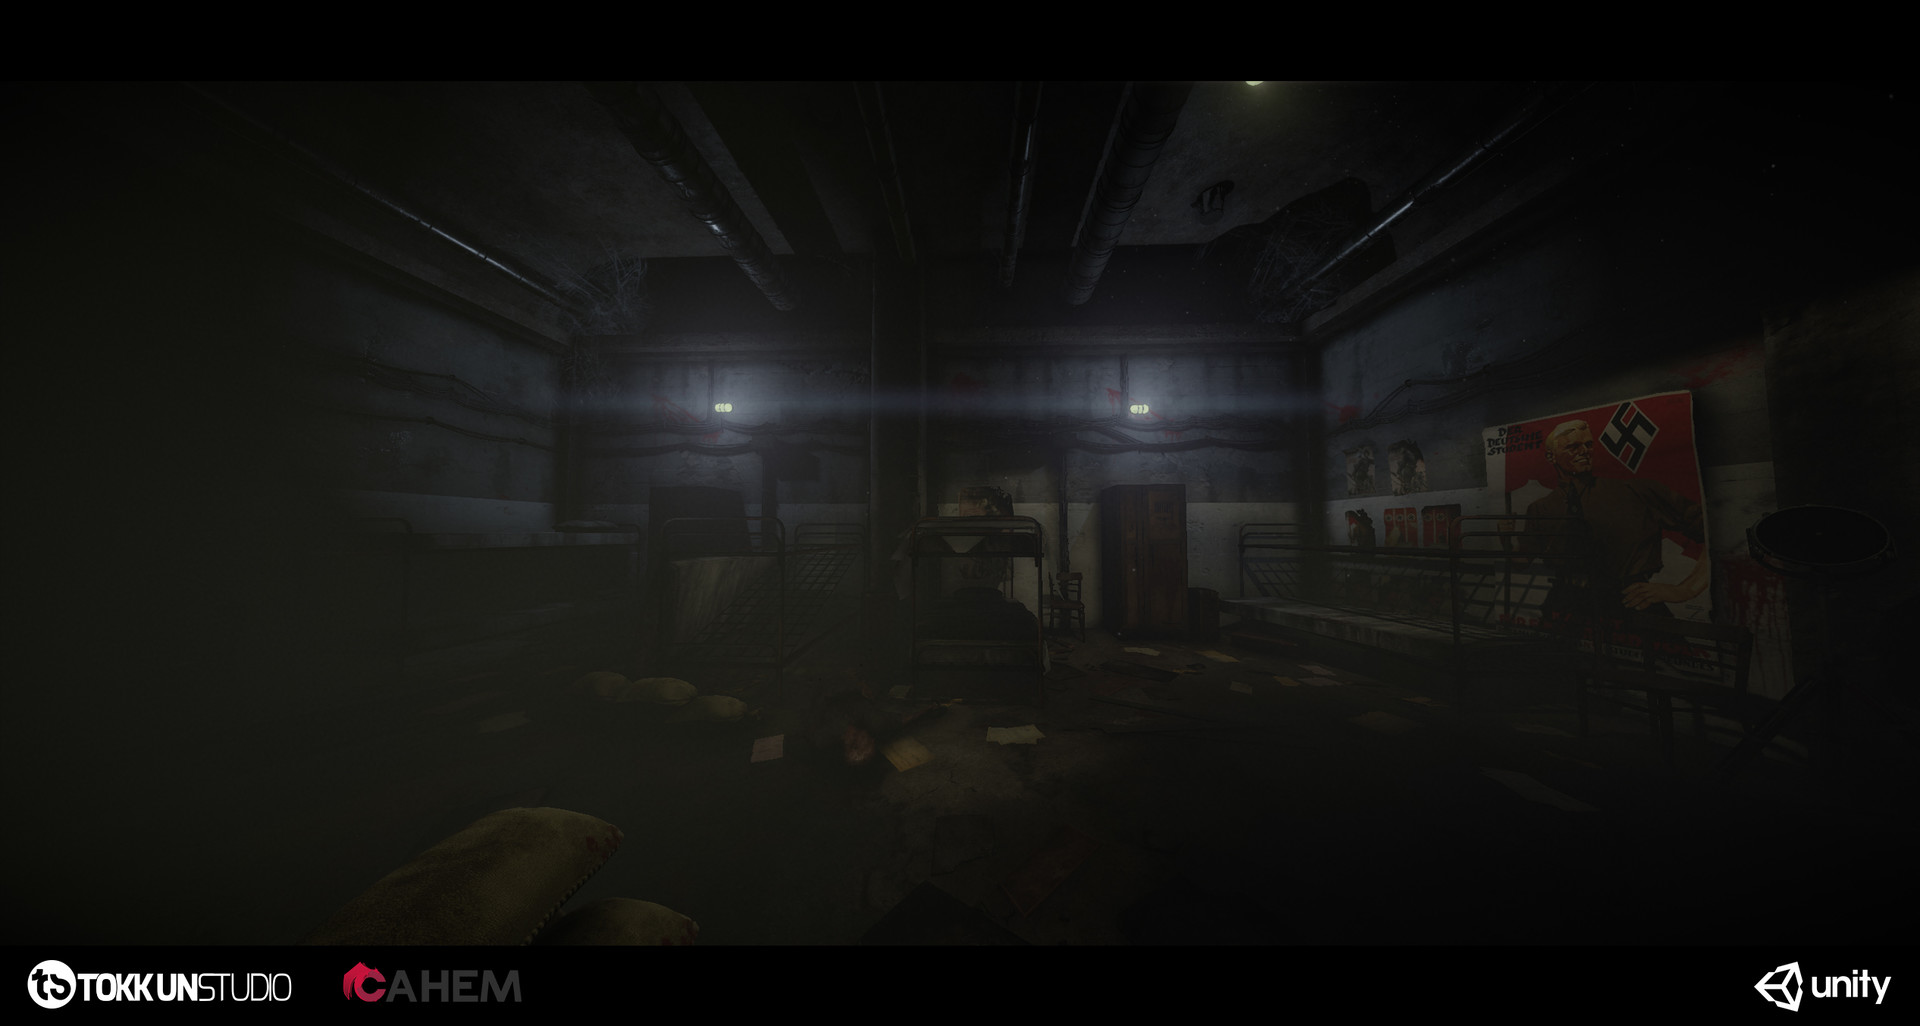 Tokkun studio bunker shot 08